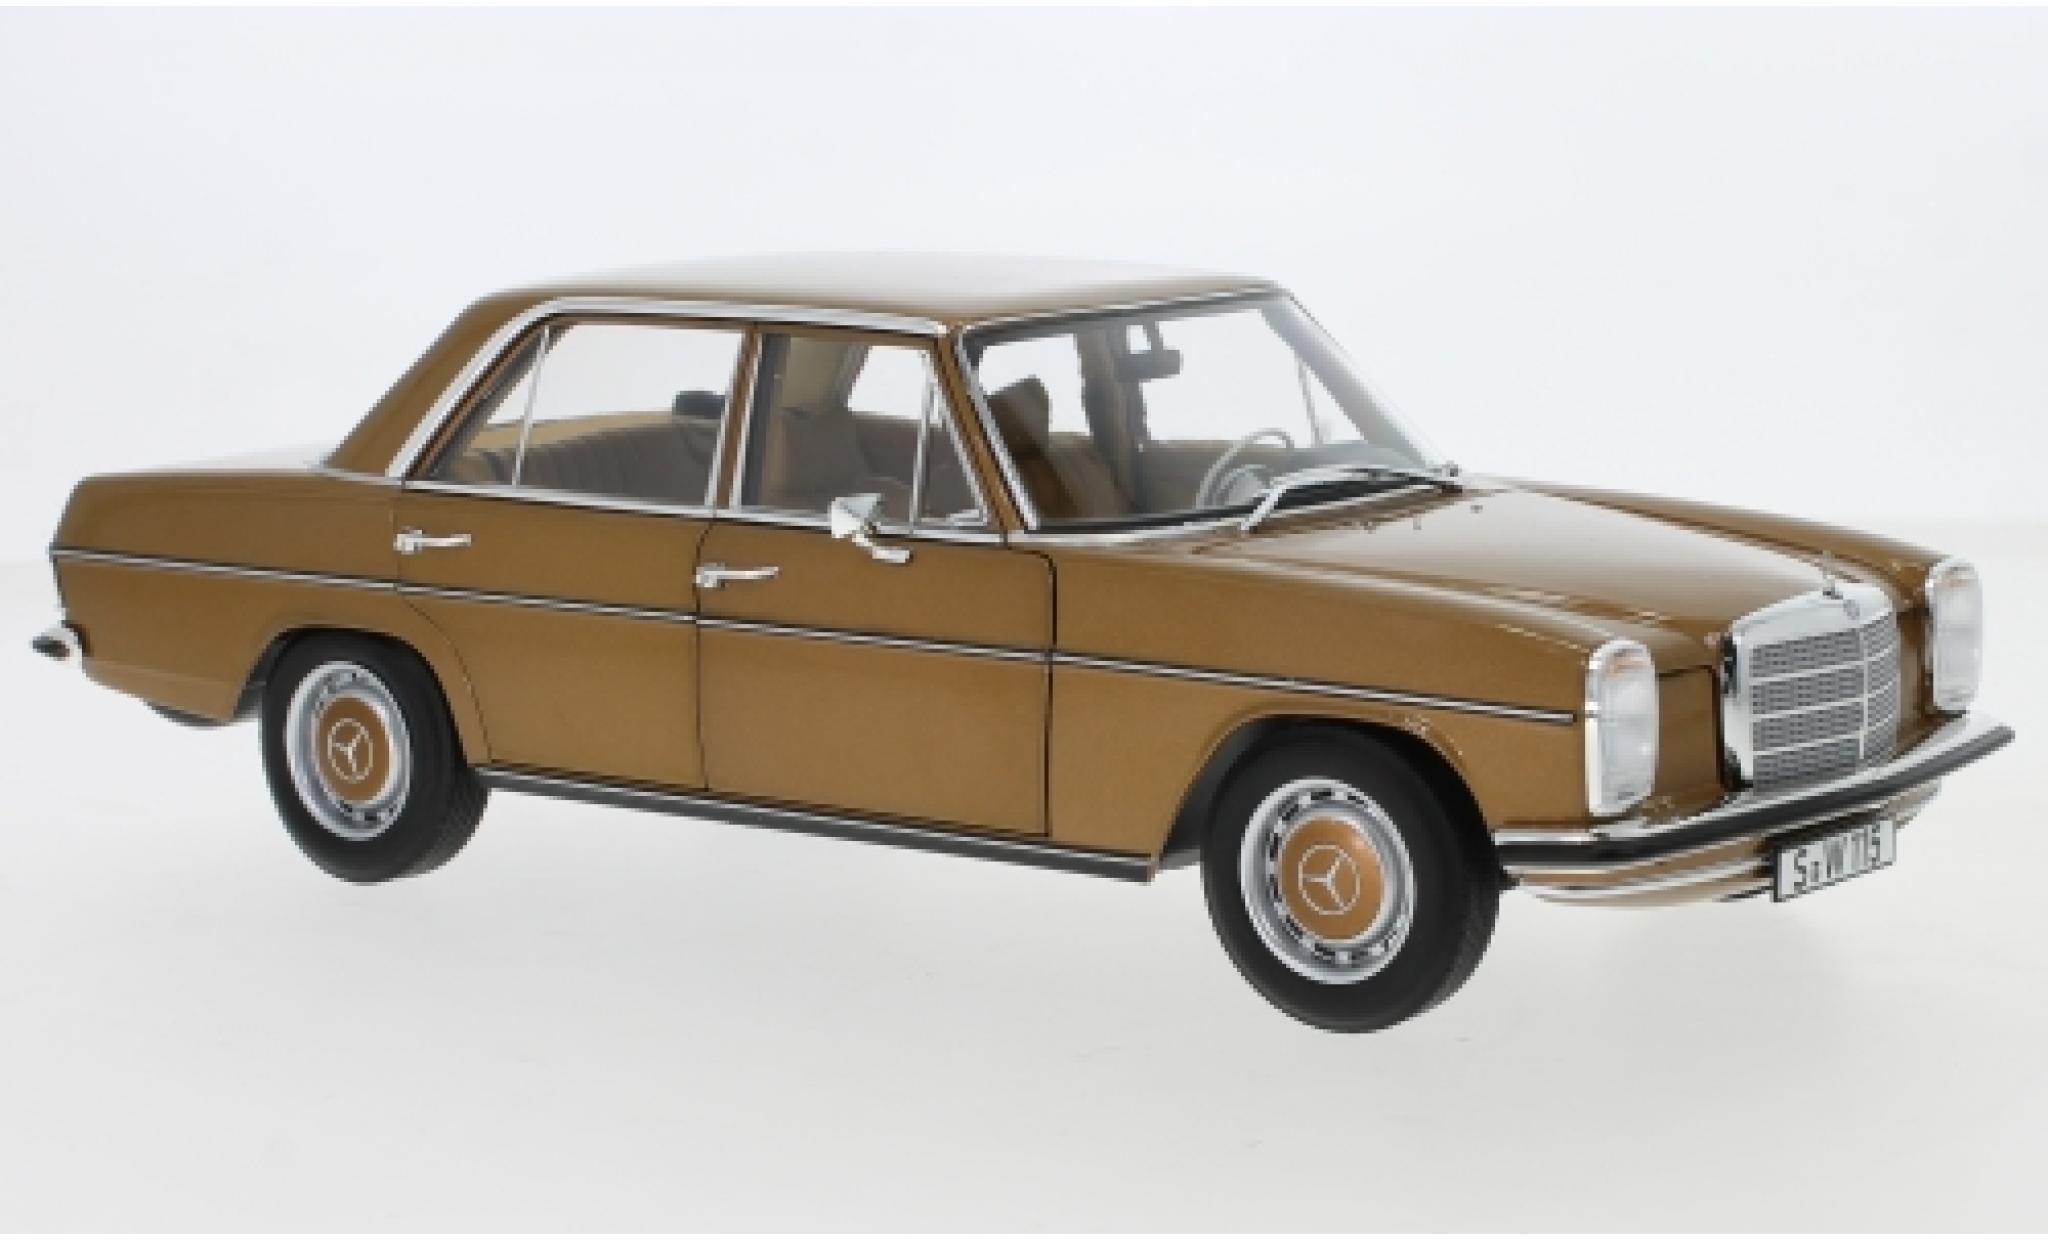 Mercedes 200 1/18 I Norev /8 (W115) metallise brown 1968